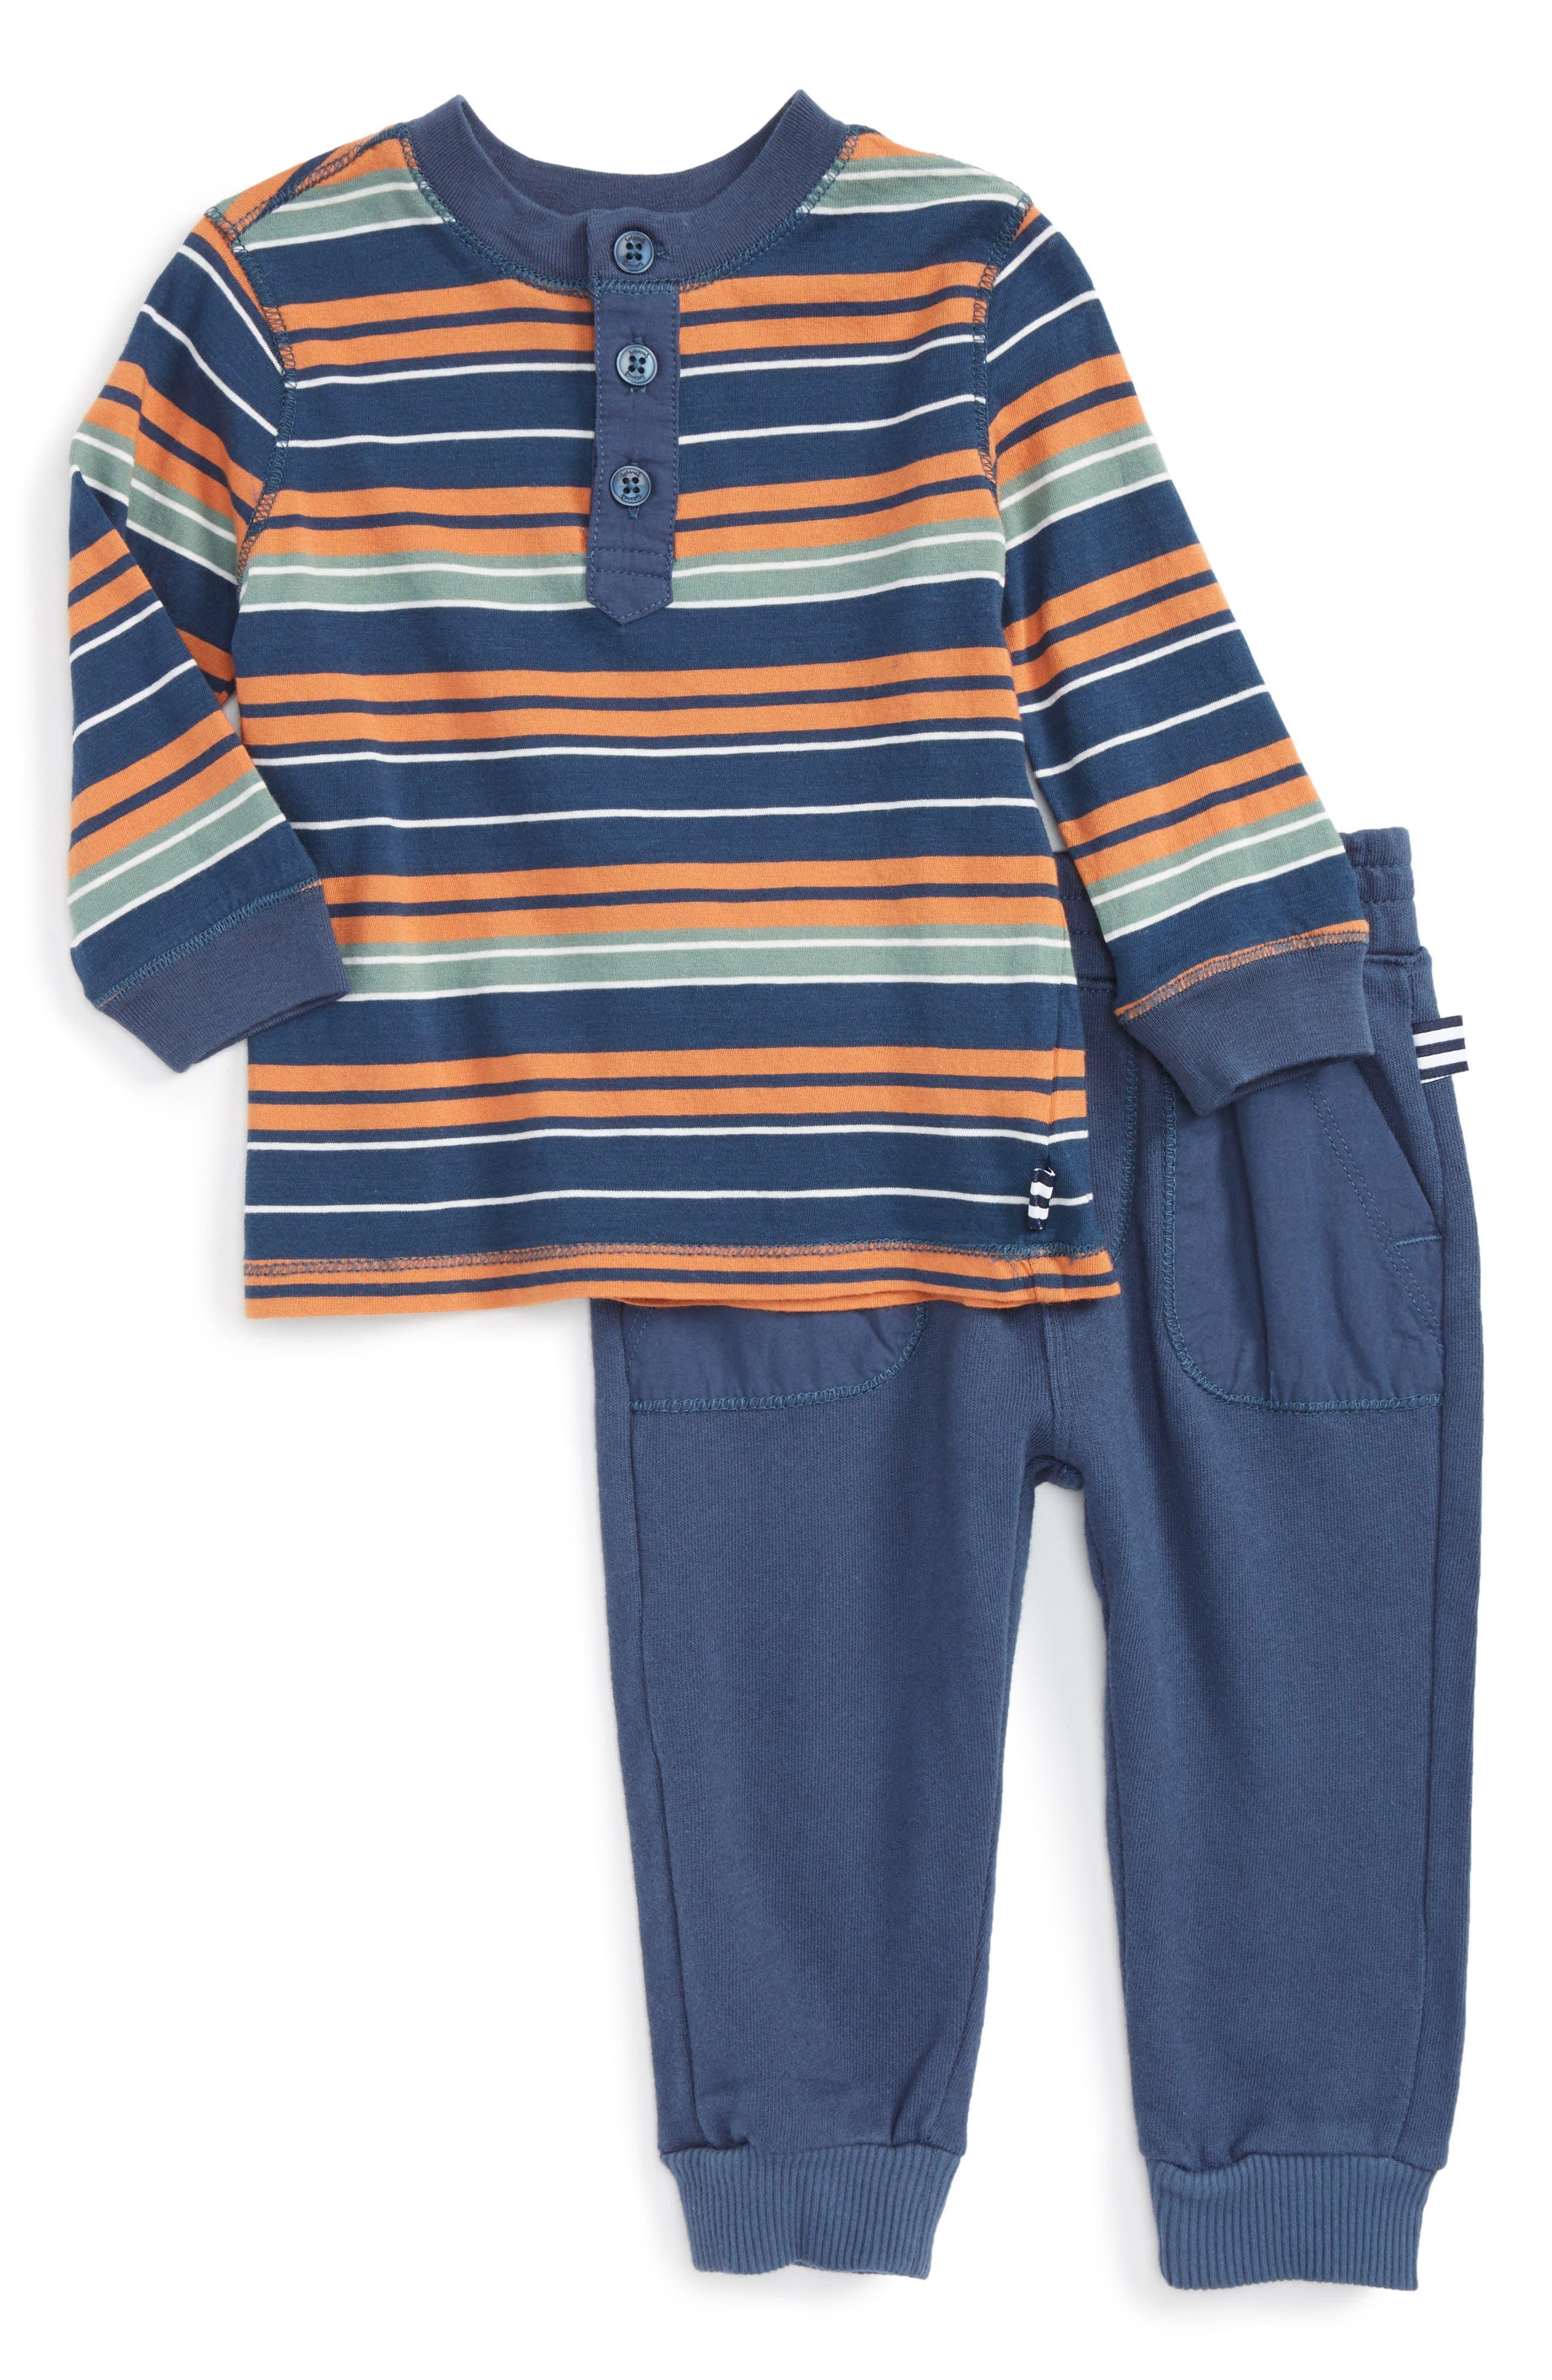 Main Image - Splendid Stripe Henley T-Shirt & Pants Set (Baby Boys)